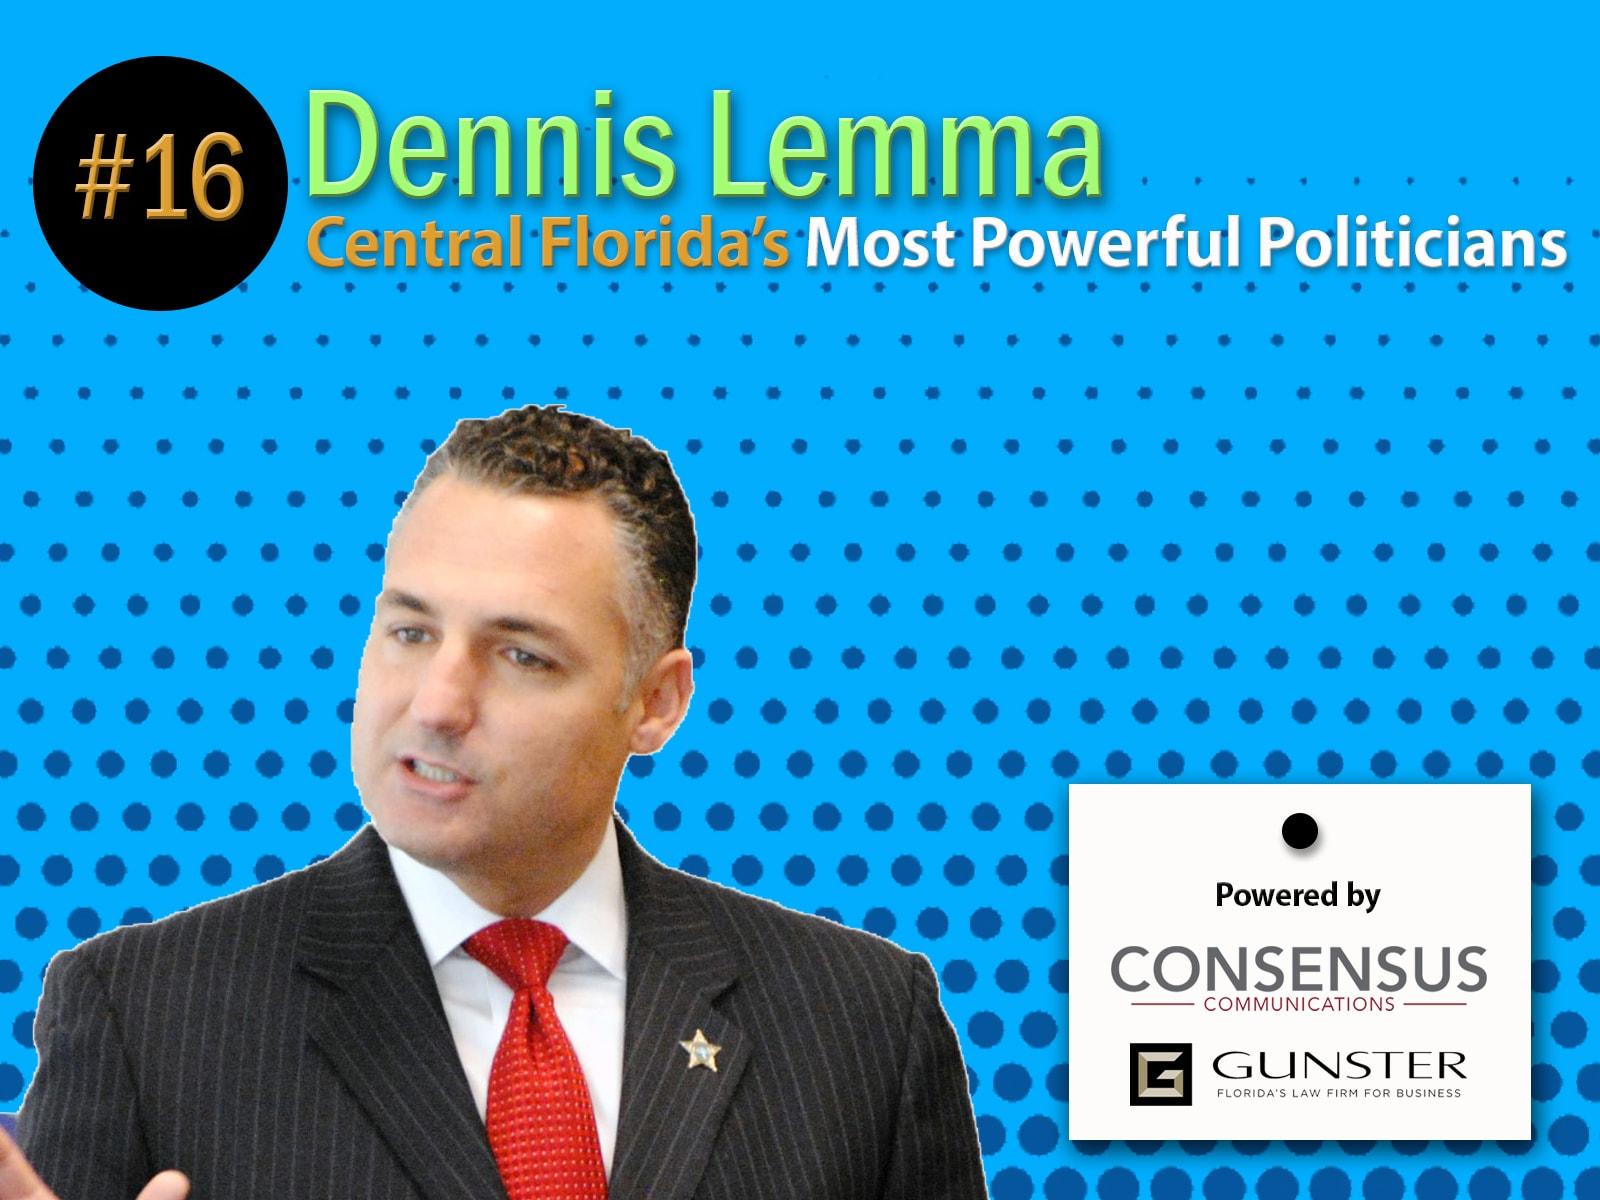 Dennis-Lemma-1.jpg